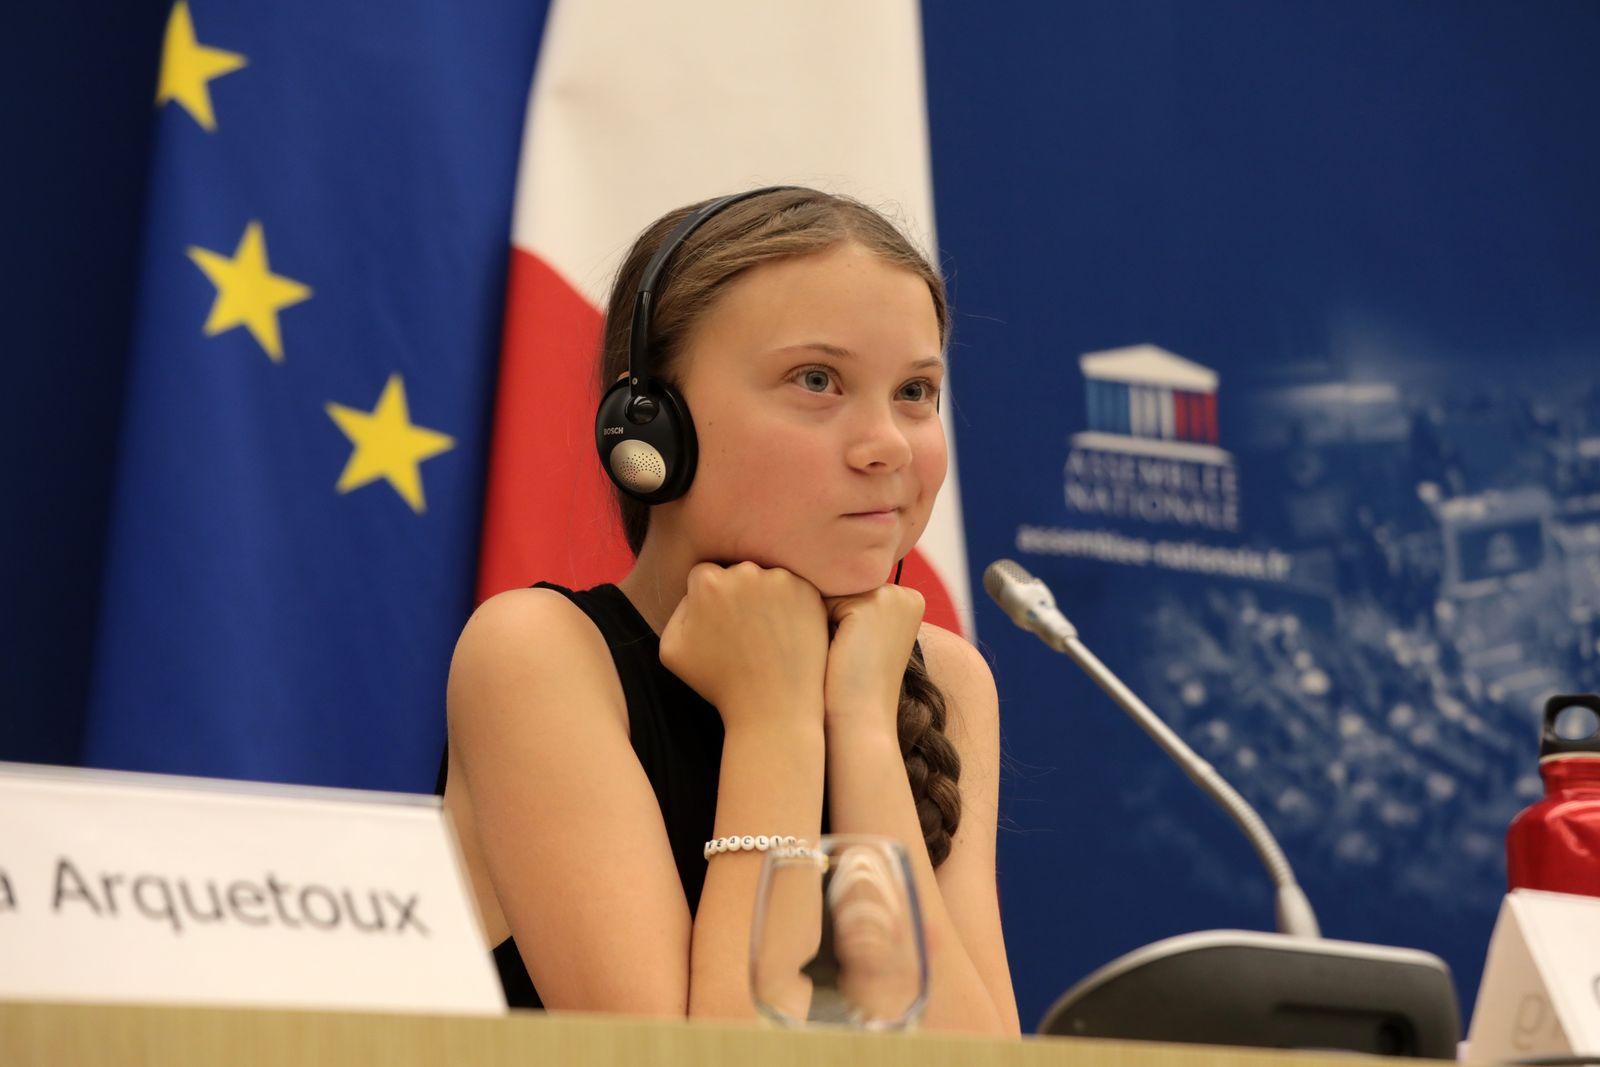 Greta Thunberg Addresses National Assembly In Paris